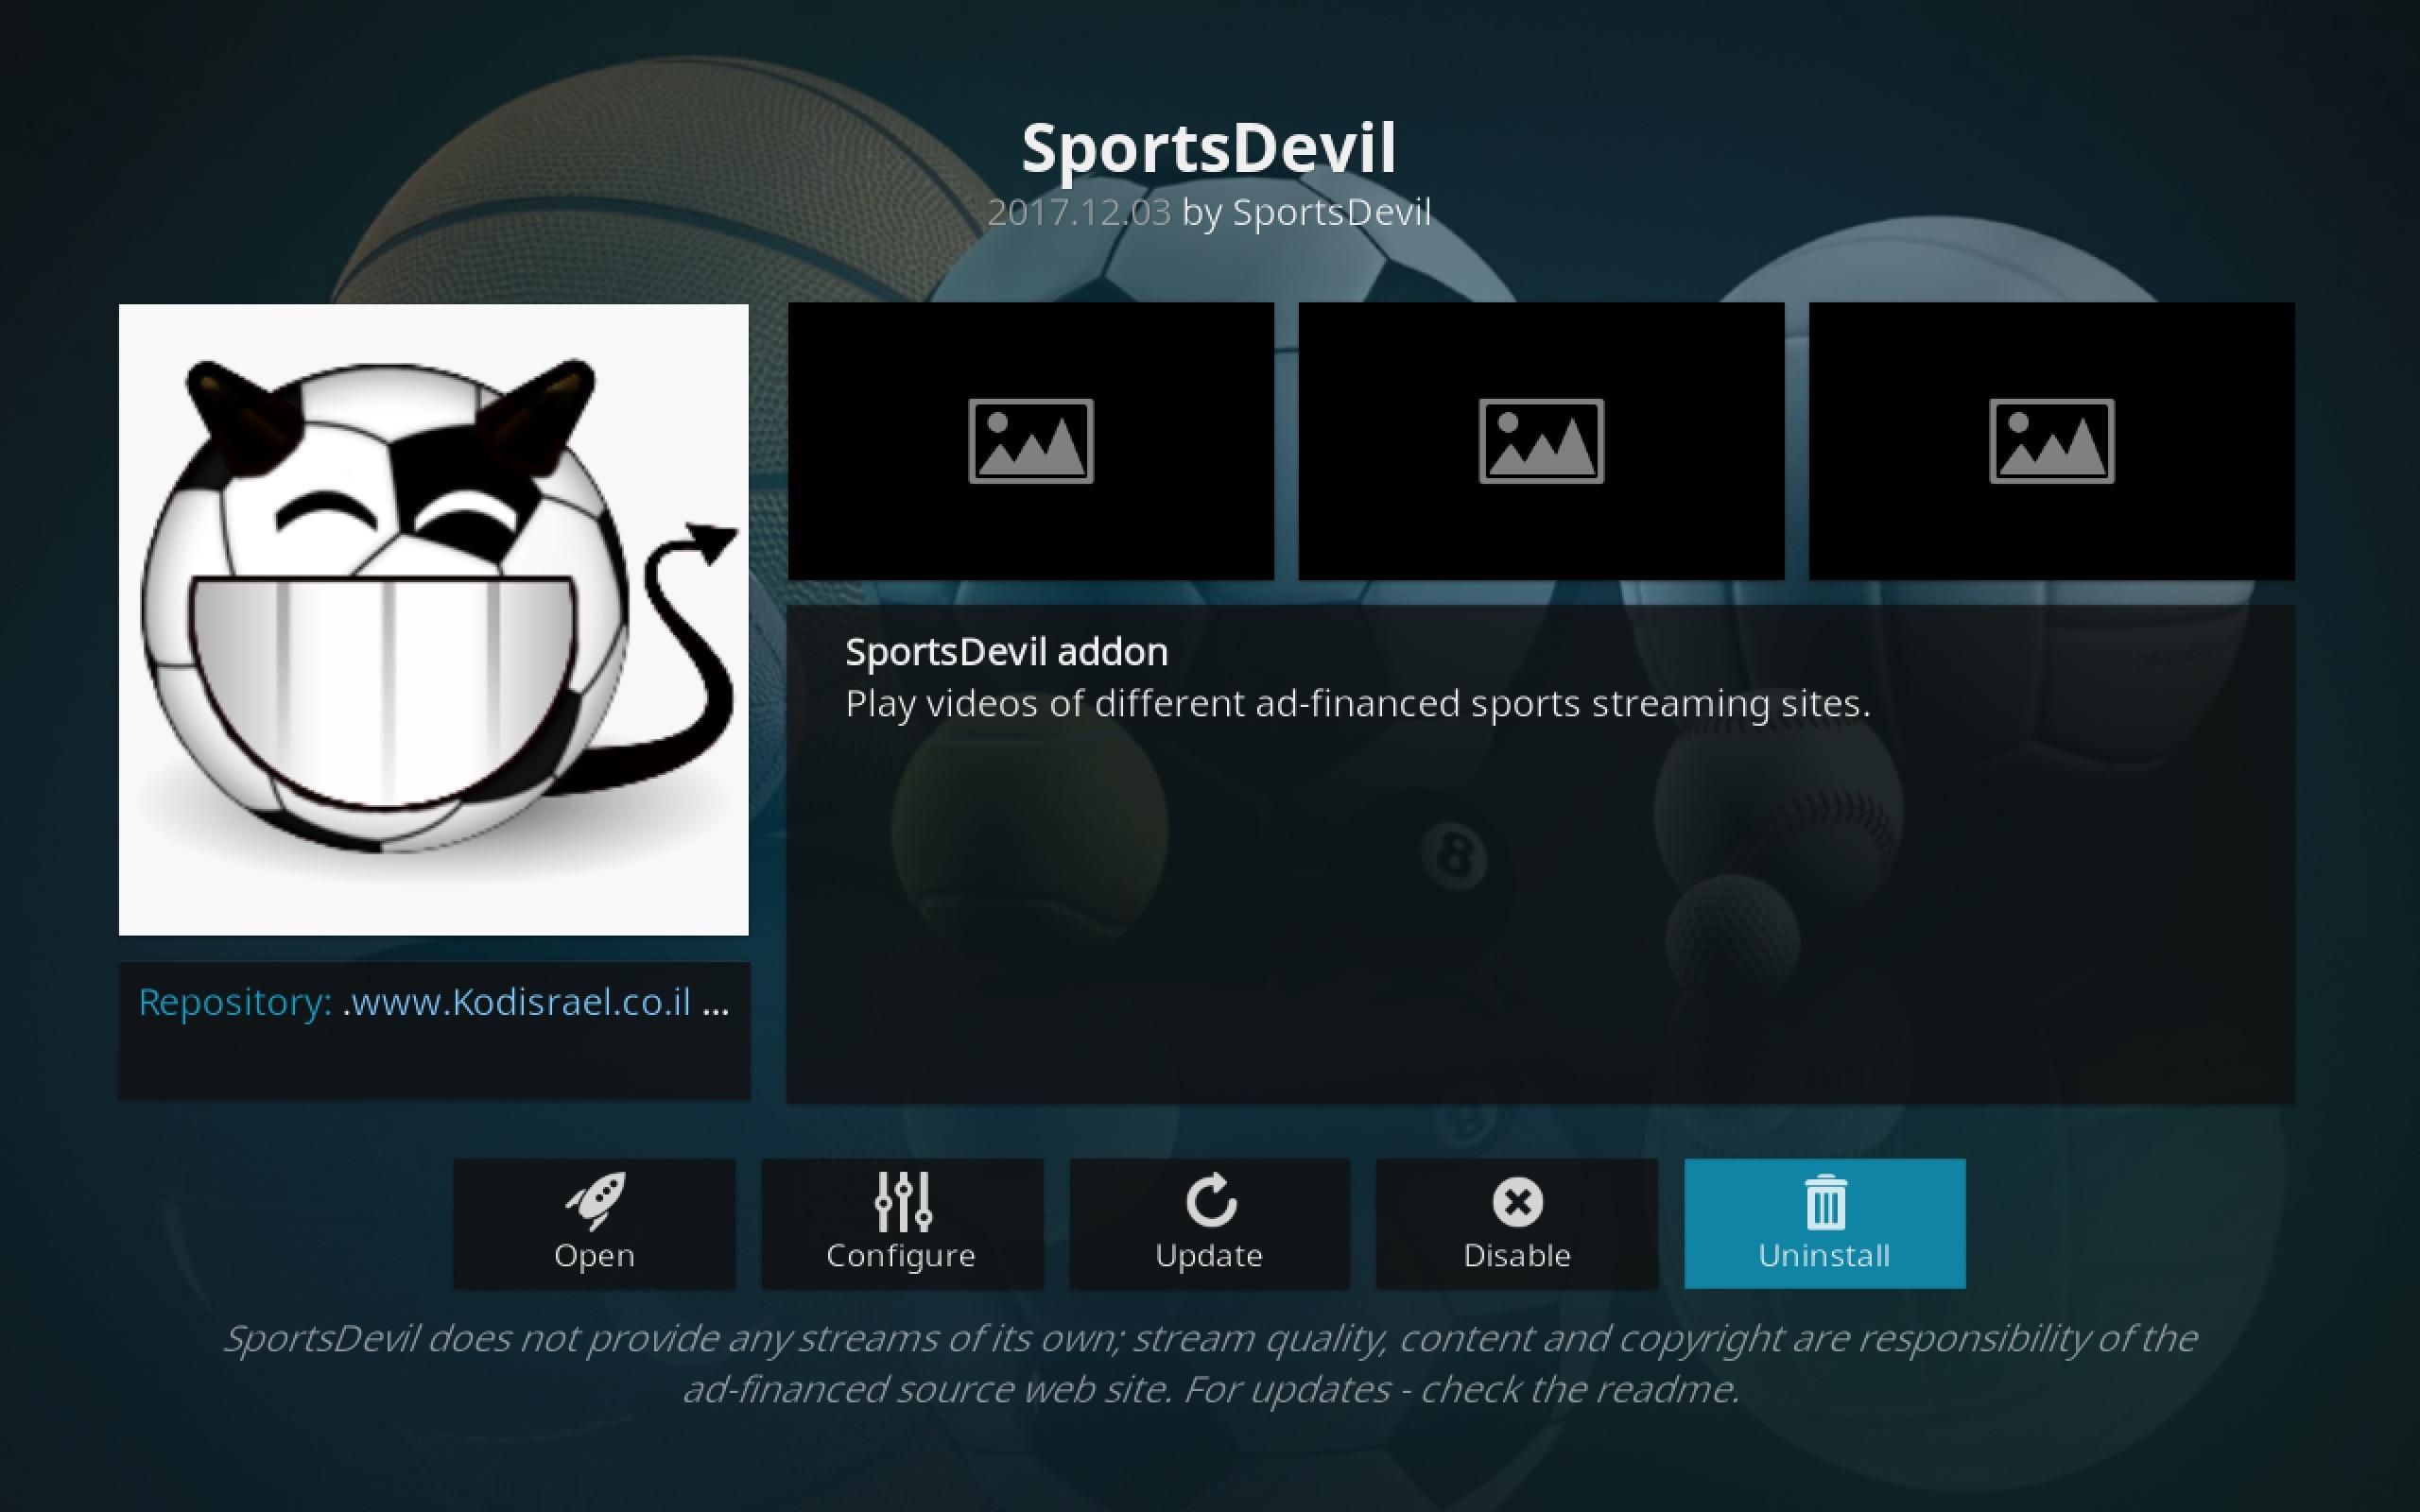 SportsDevil add-on